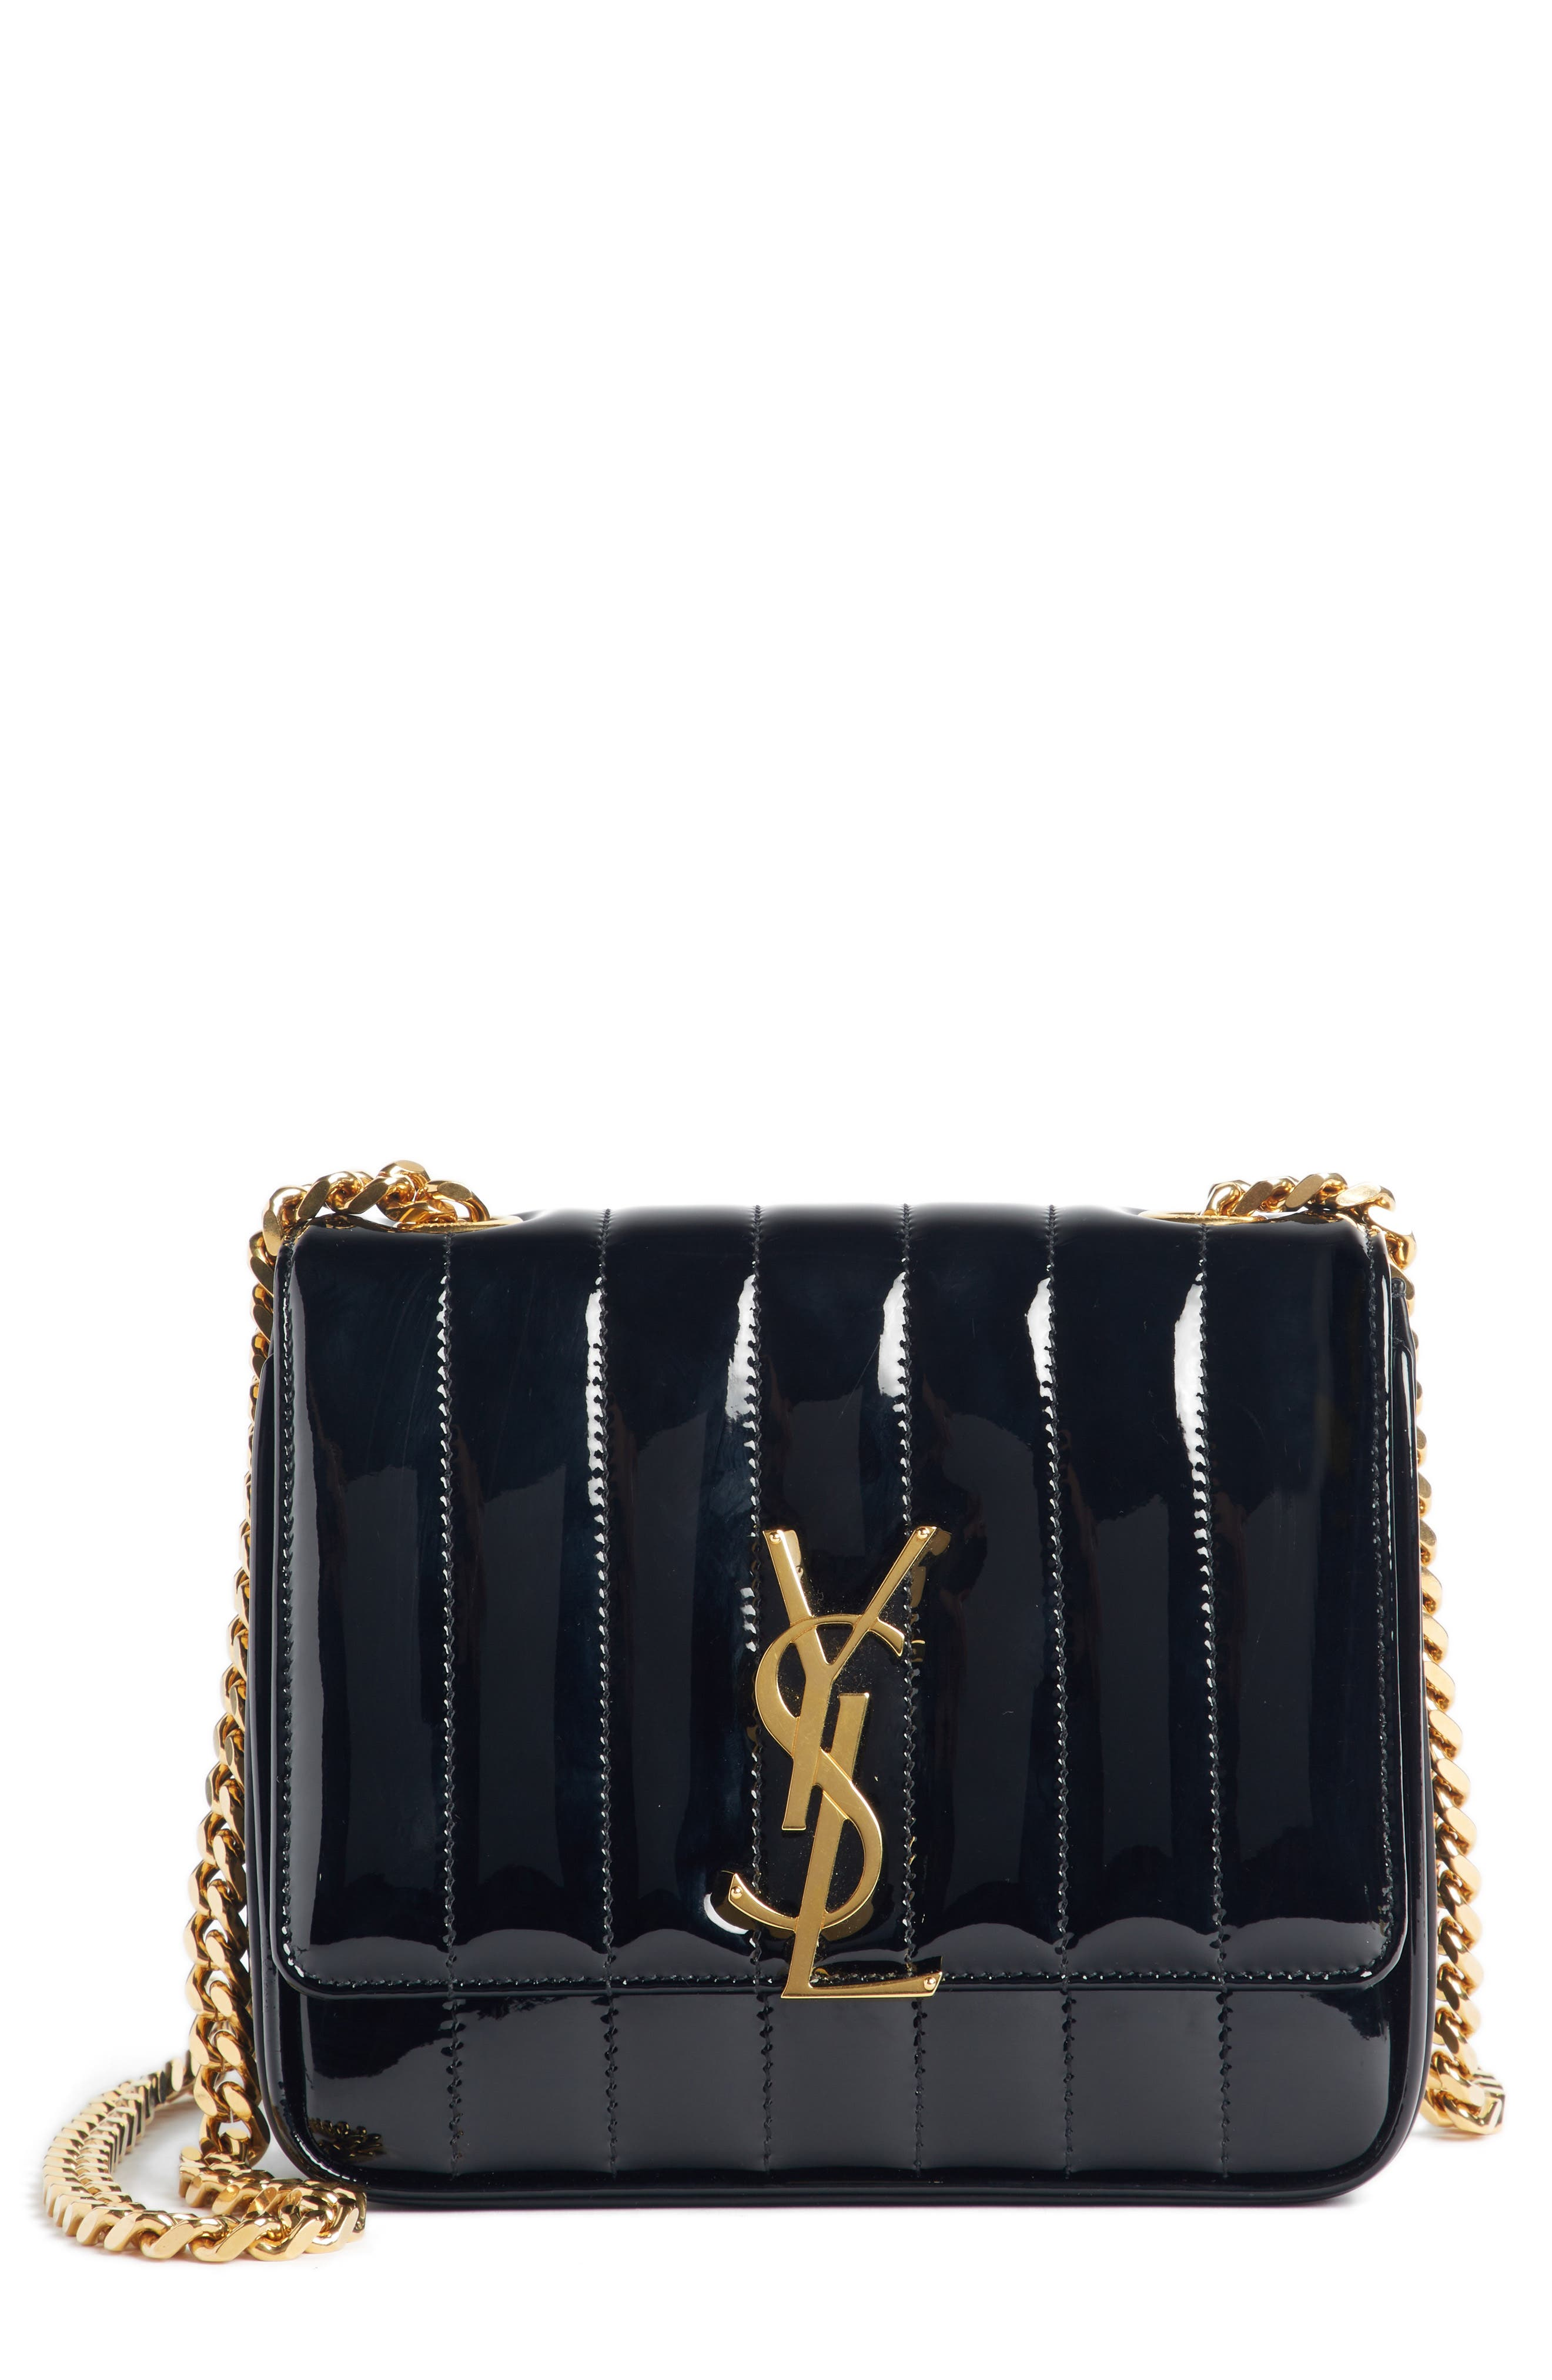 SAINT LAURENT, Small Vicky Patent Leather Crossbody Bag, Main thumbnail 1, color, NOIR